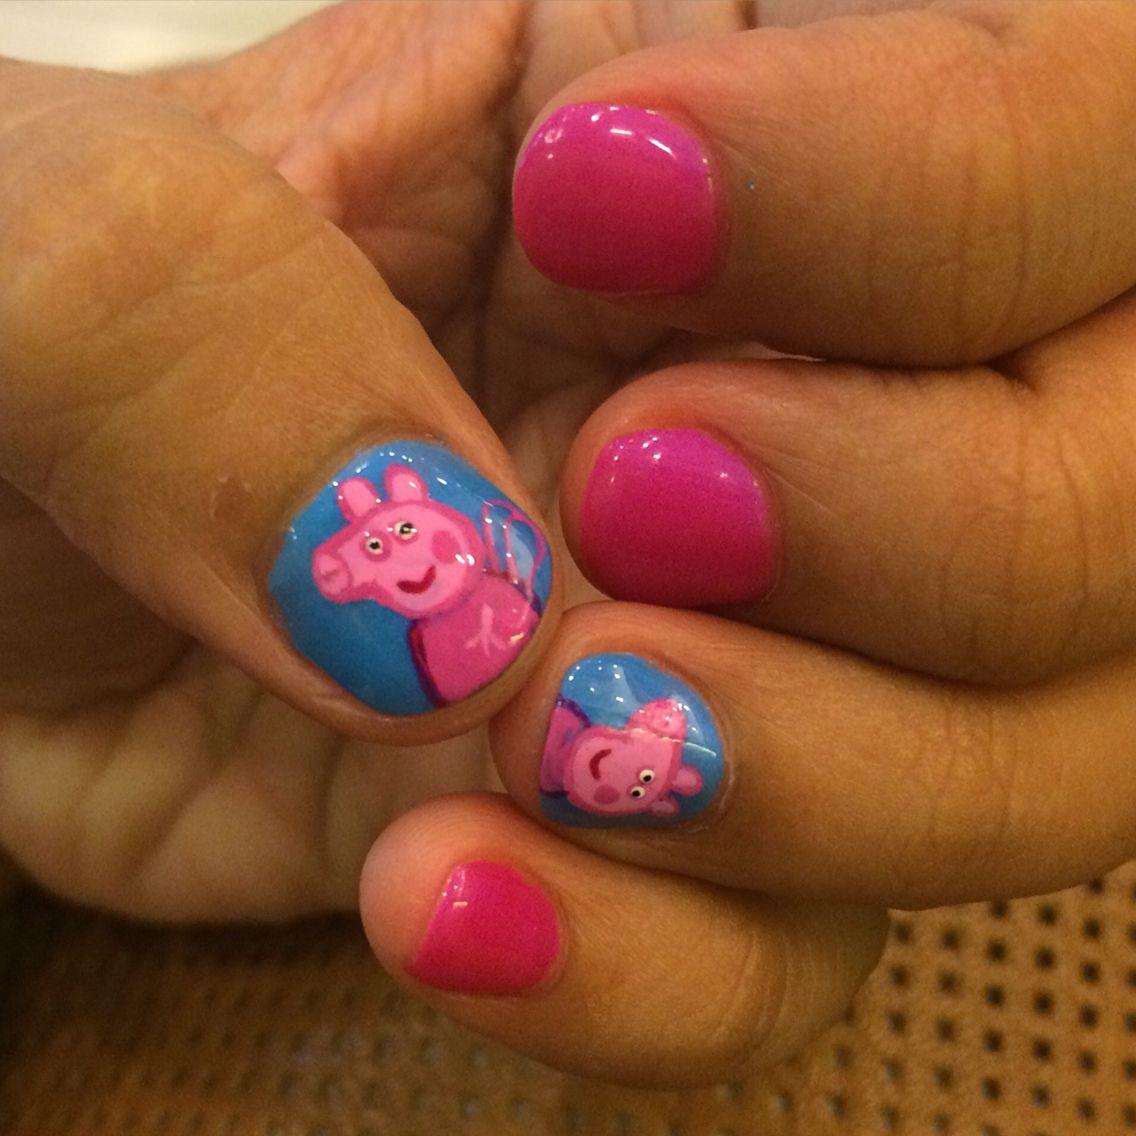 Peppa pig nail art | Reilly 1st birthday | Pinterest | Pig ...